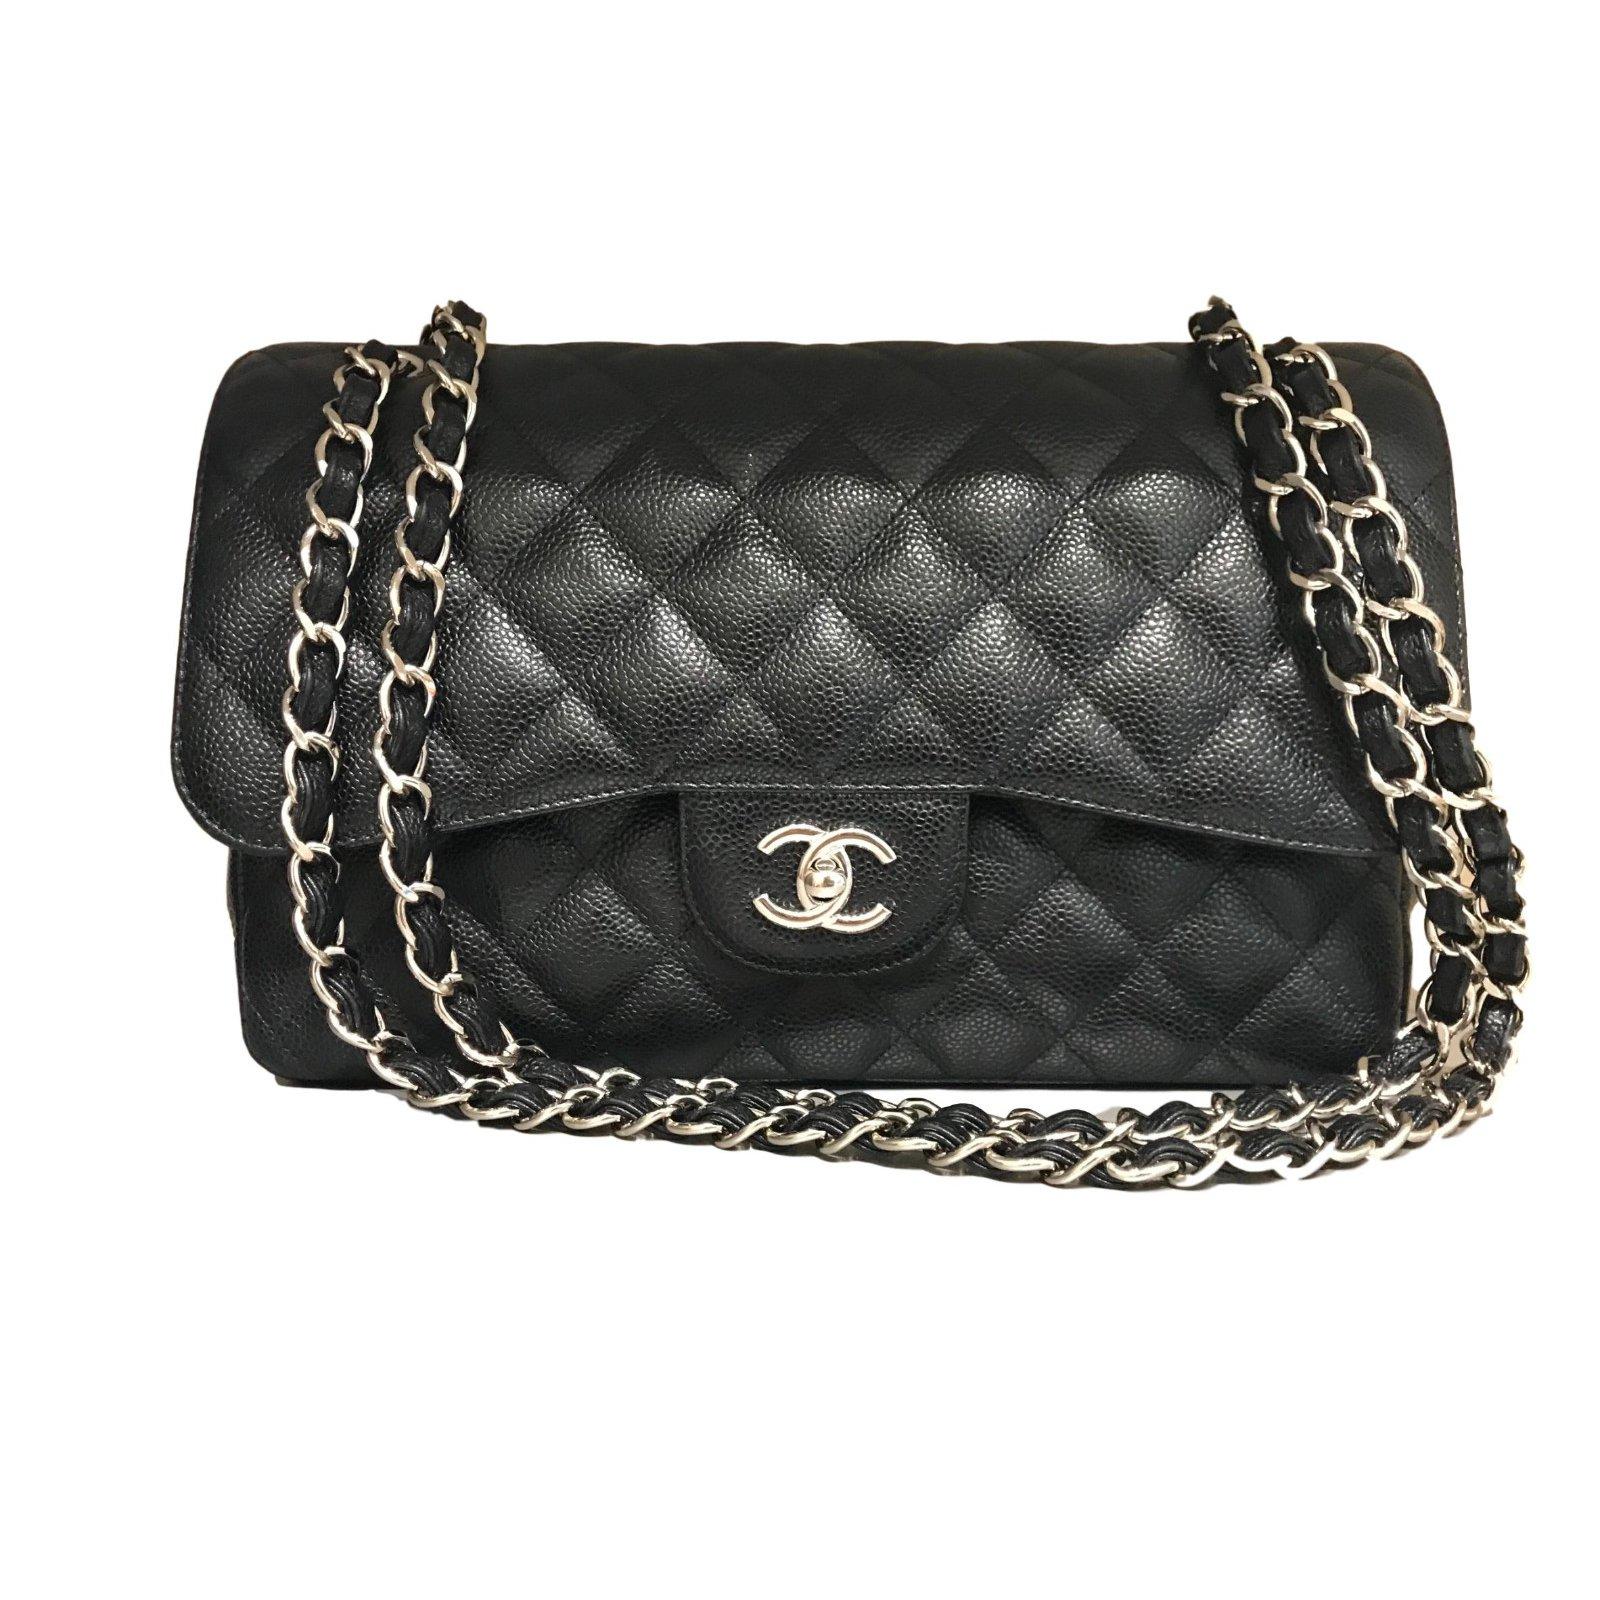 chanel timeless handbags leather black joli closet. Black Bedroom Furniture Sets. Home Design Ideas